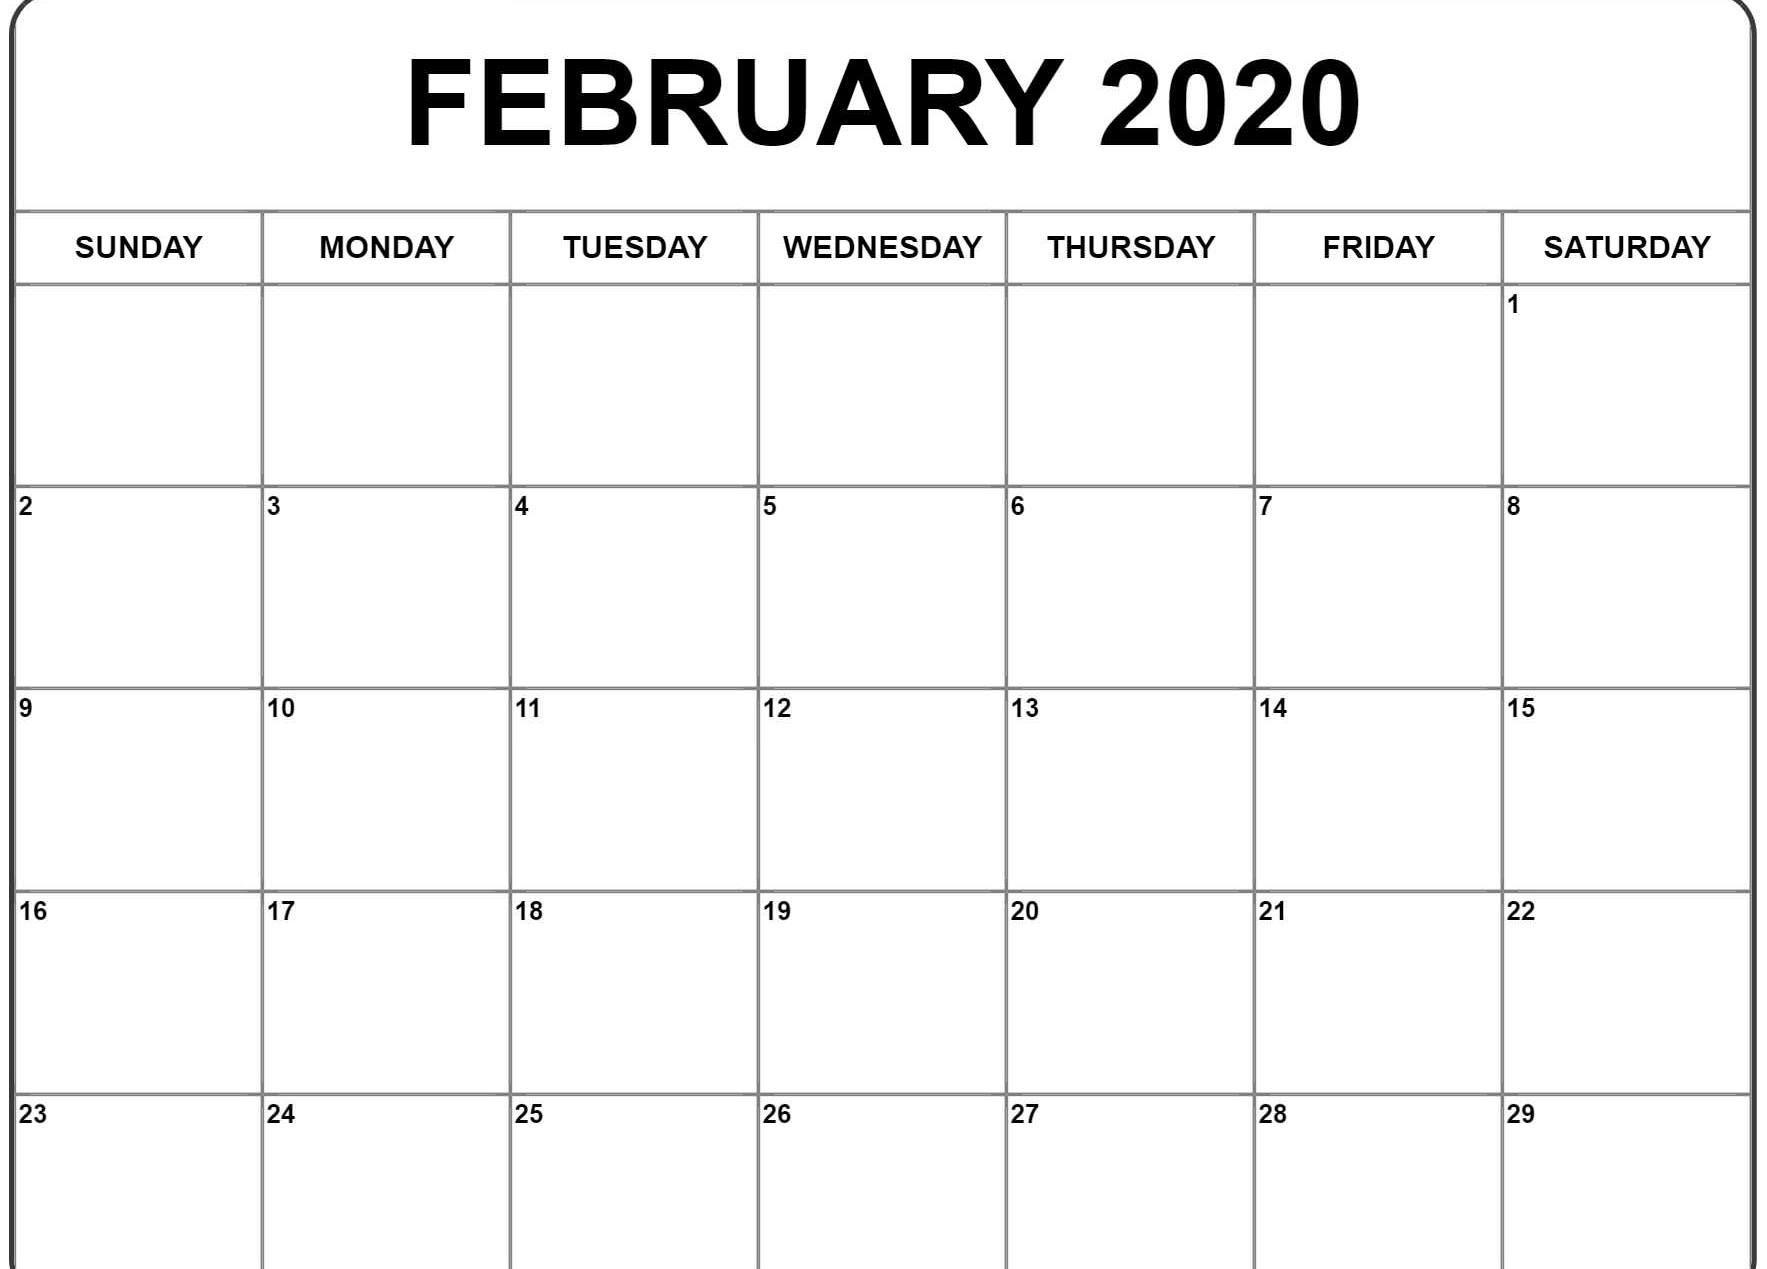 February 2020 Calendar Word | February Calendar, Free 2020 Monthly Calendar Template Word